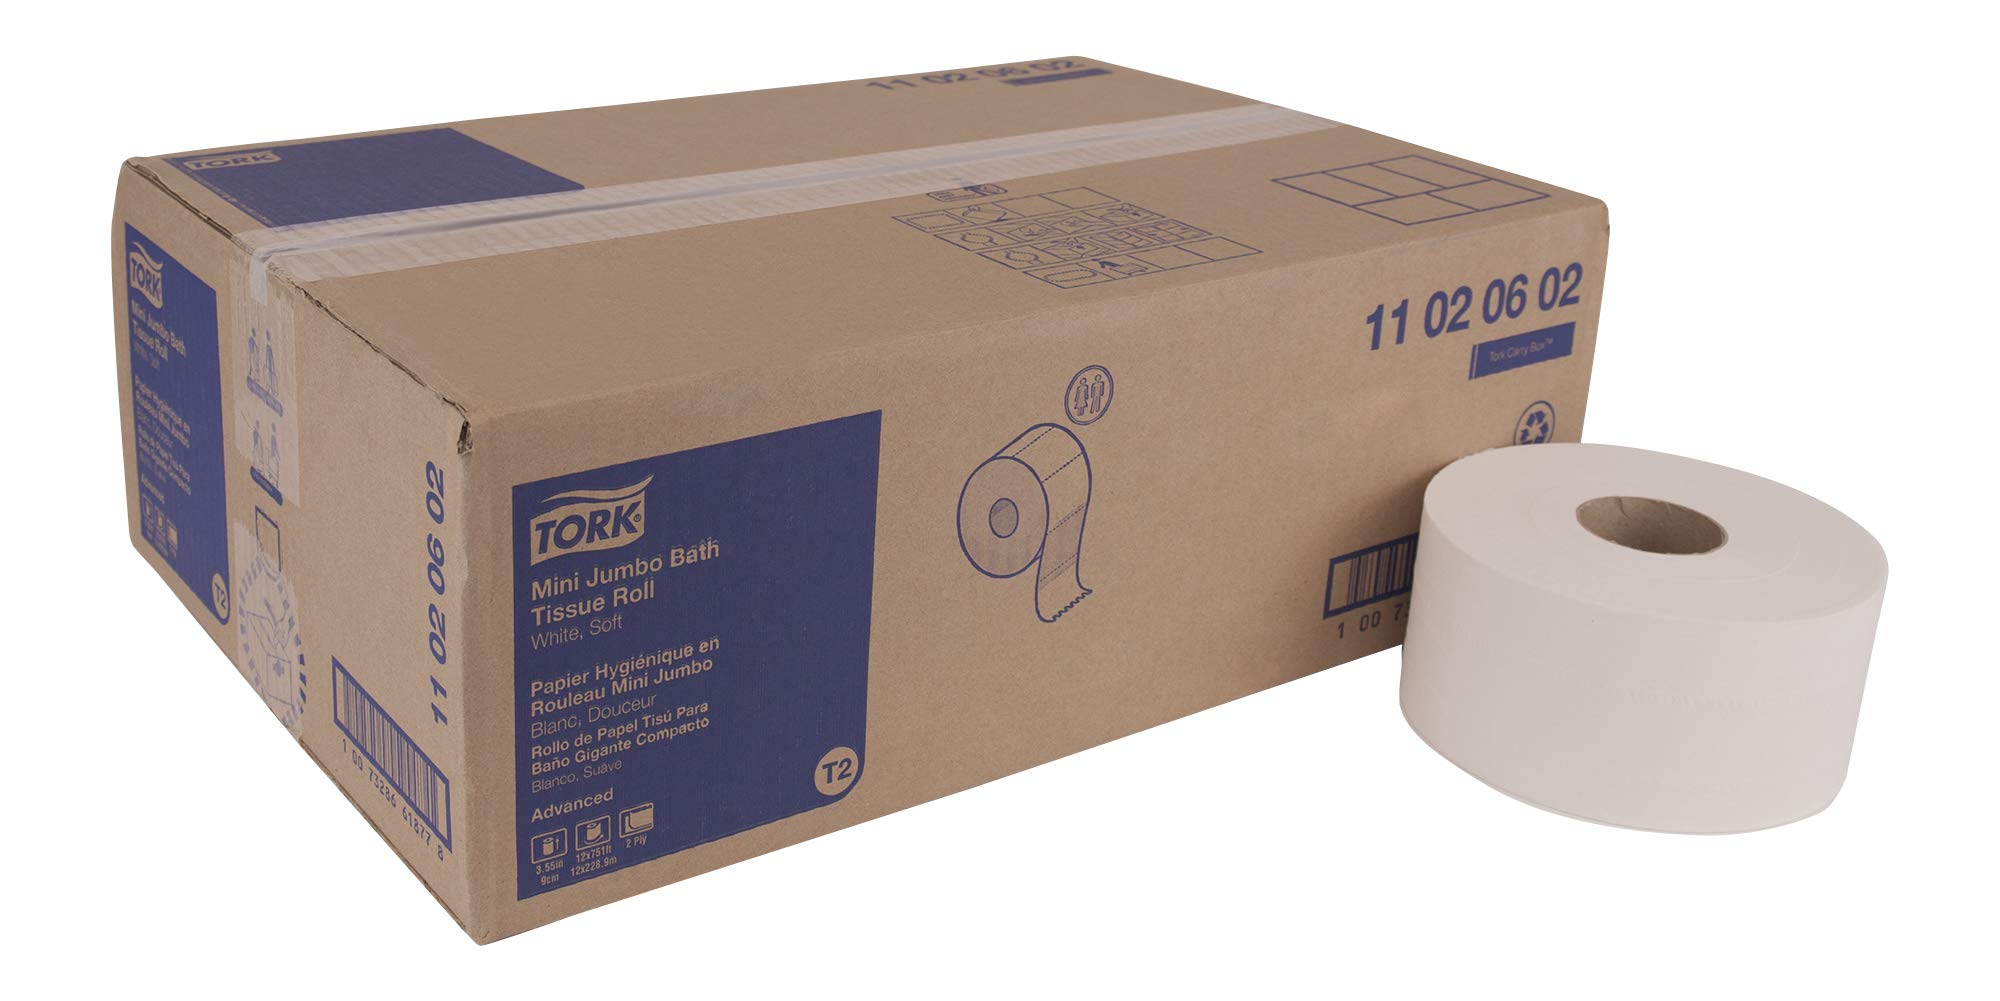 "Tork Advanced 11020602 Soft Mini Jumbo Bath Tissue Roll, Perforated, 2-Ply, 7.36"" Diameter, 3.55"" Width x 8.38"" Length, White (Case of 12 Rolls, 1,075 per Roll, 12,900 Sheets)"